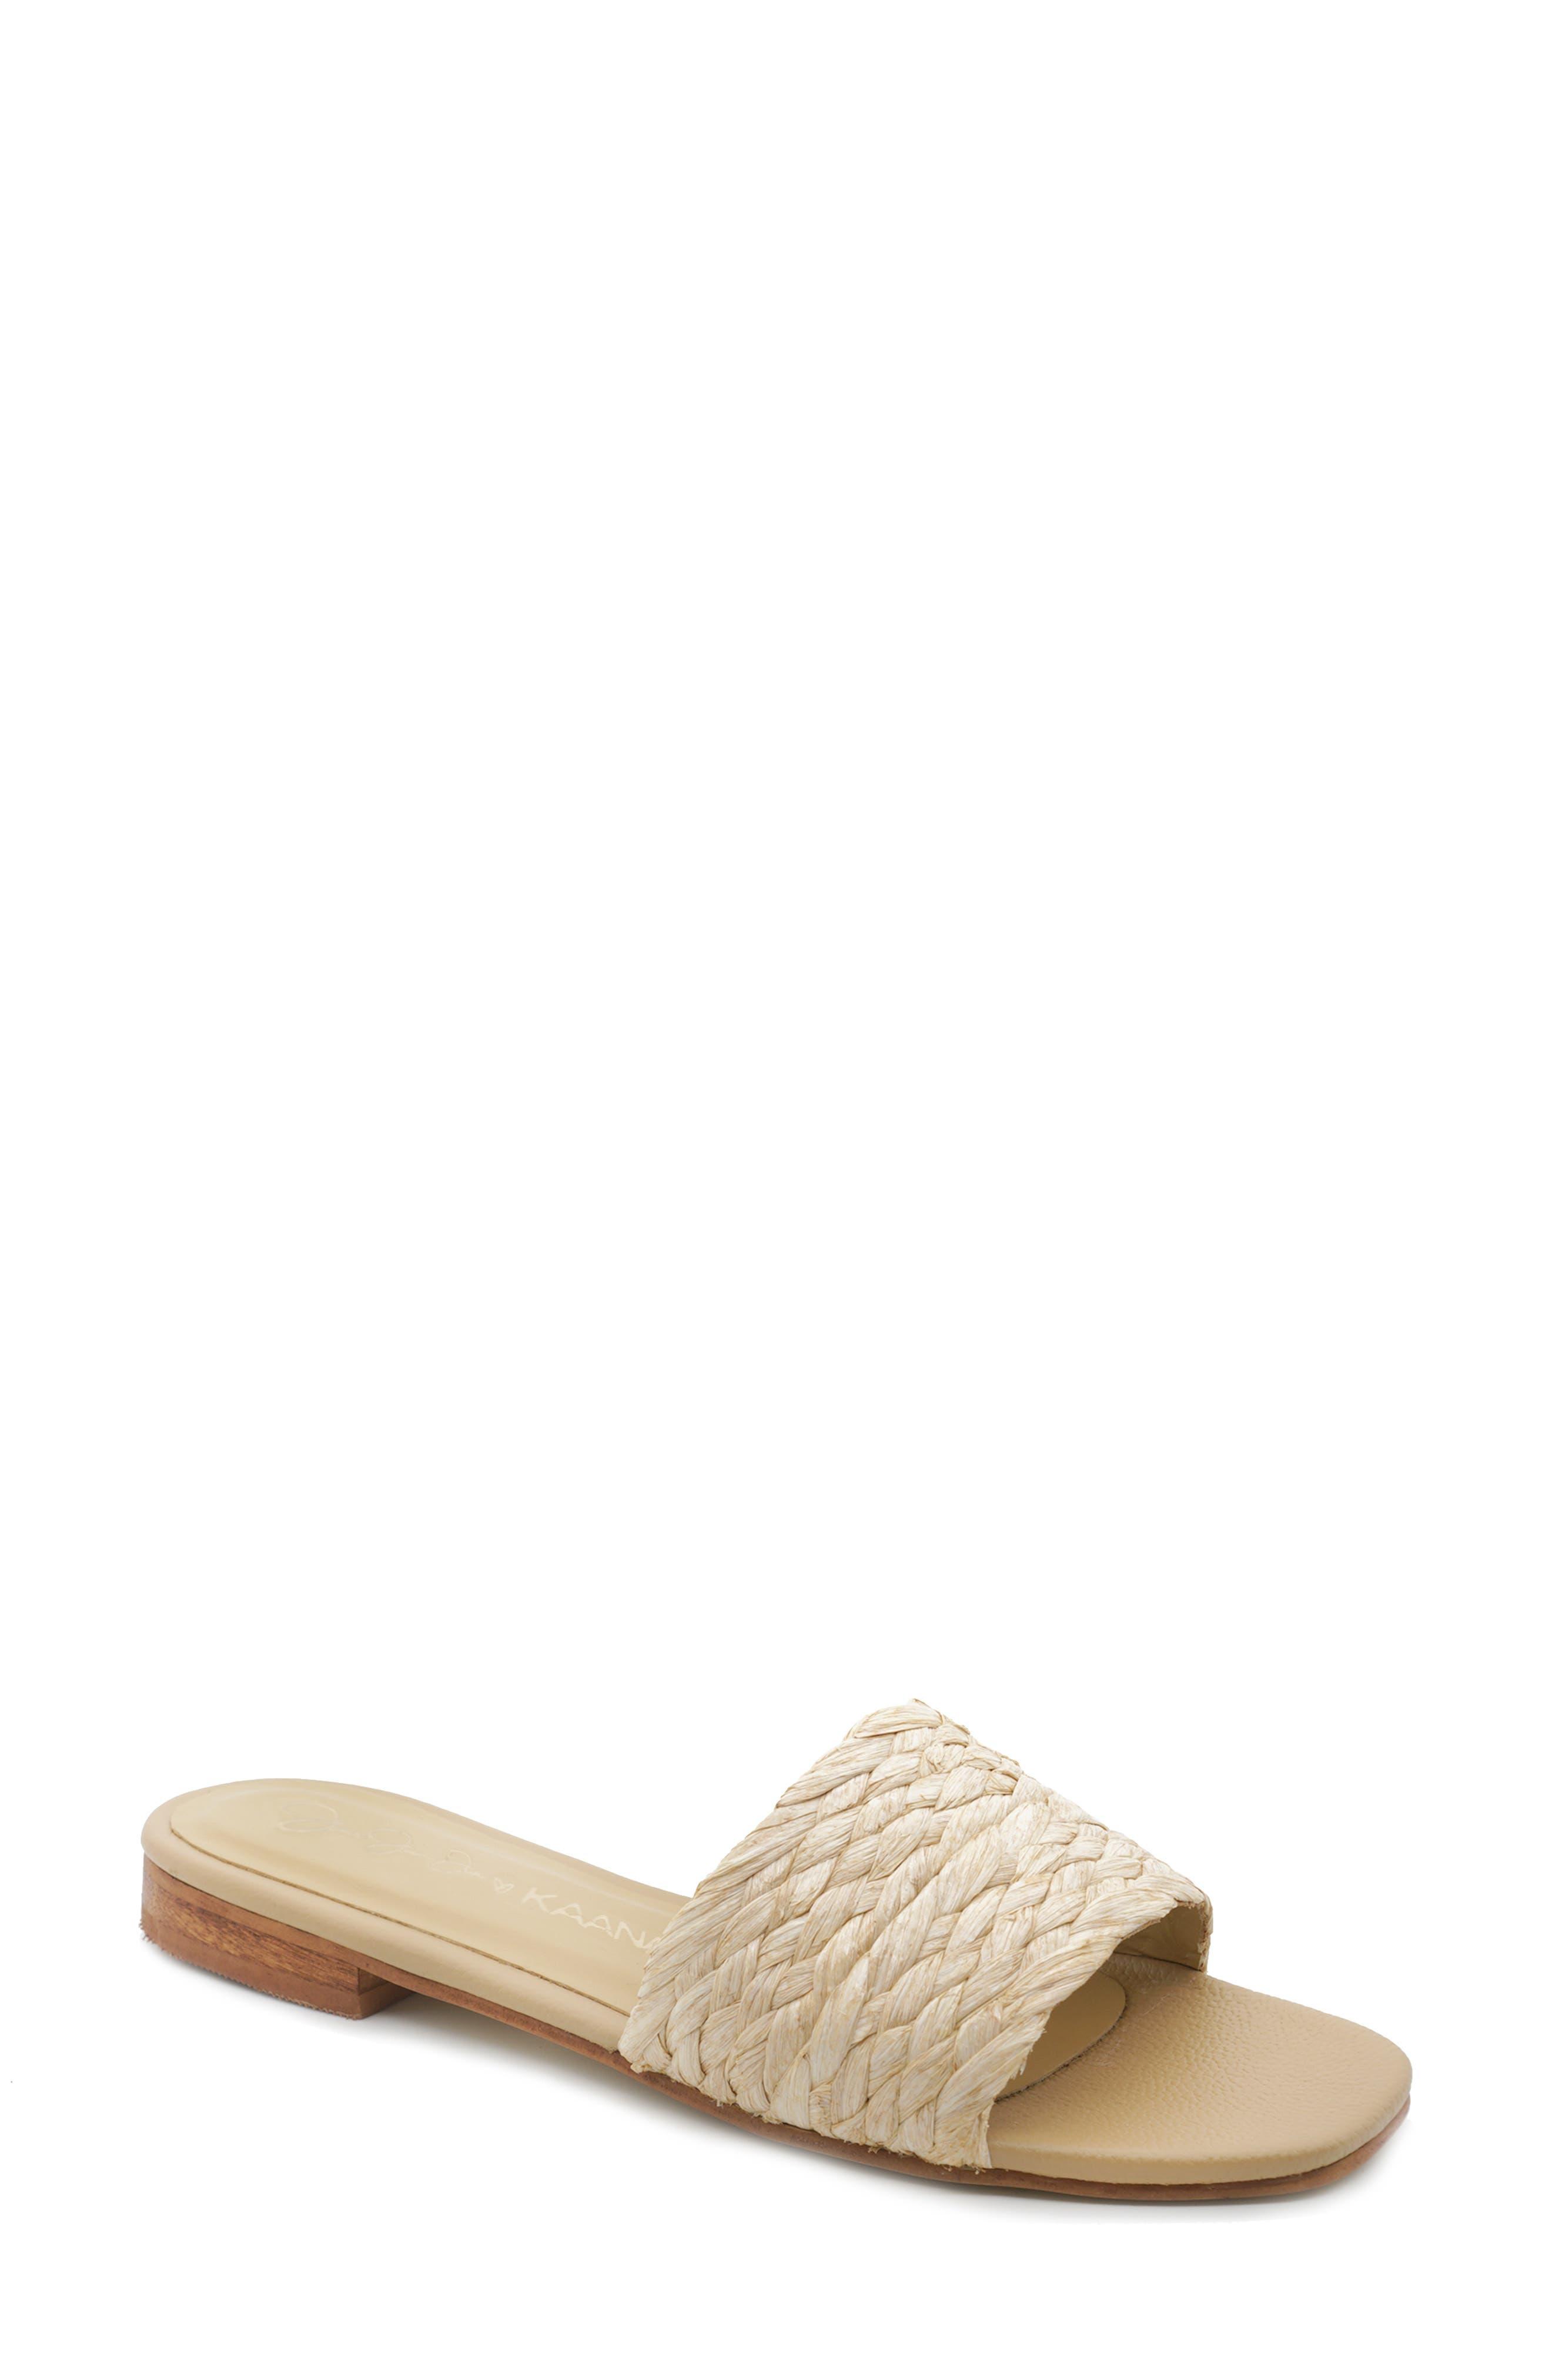 X Jessie James Decker Key Largo Slide Sandal